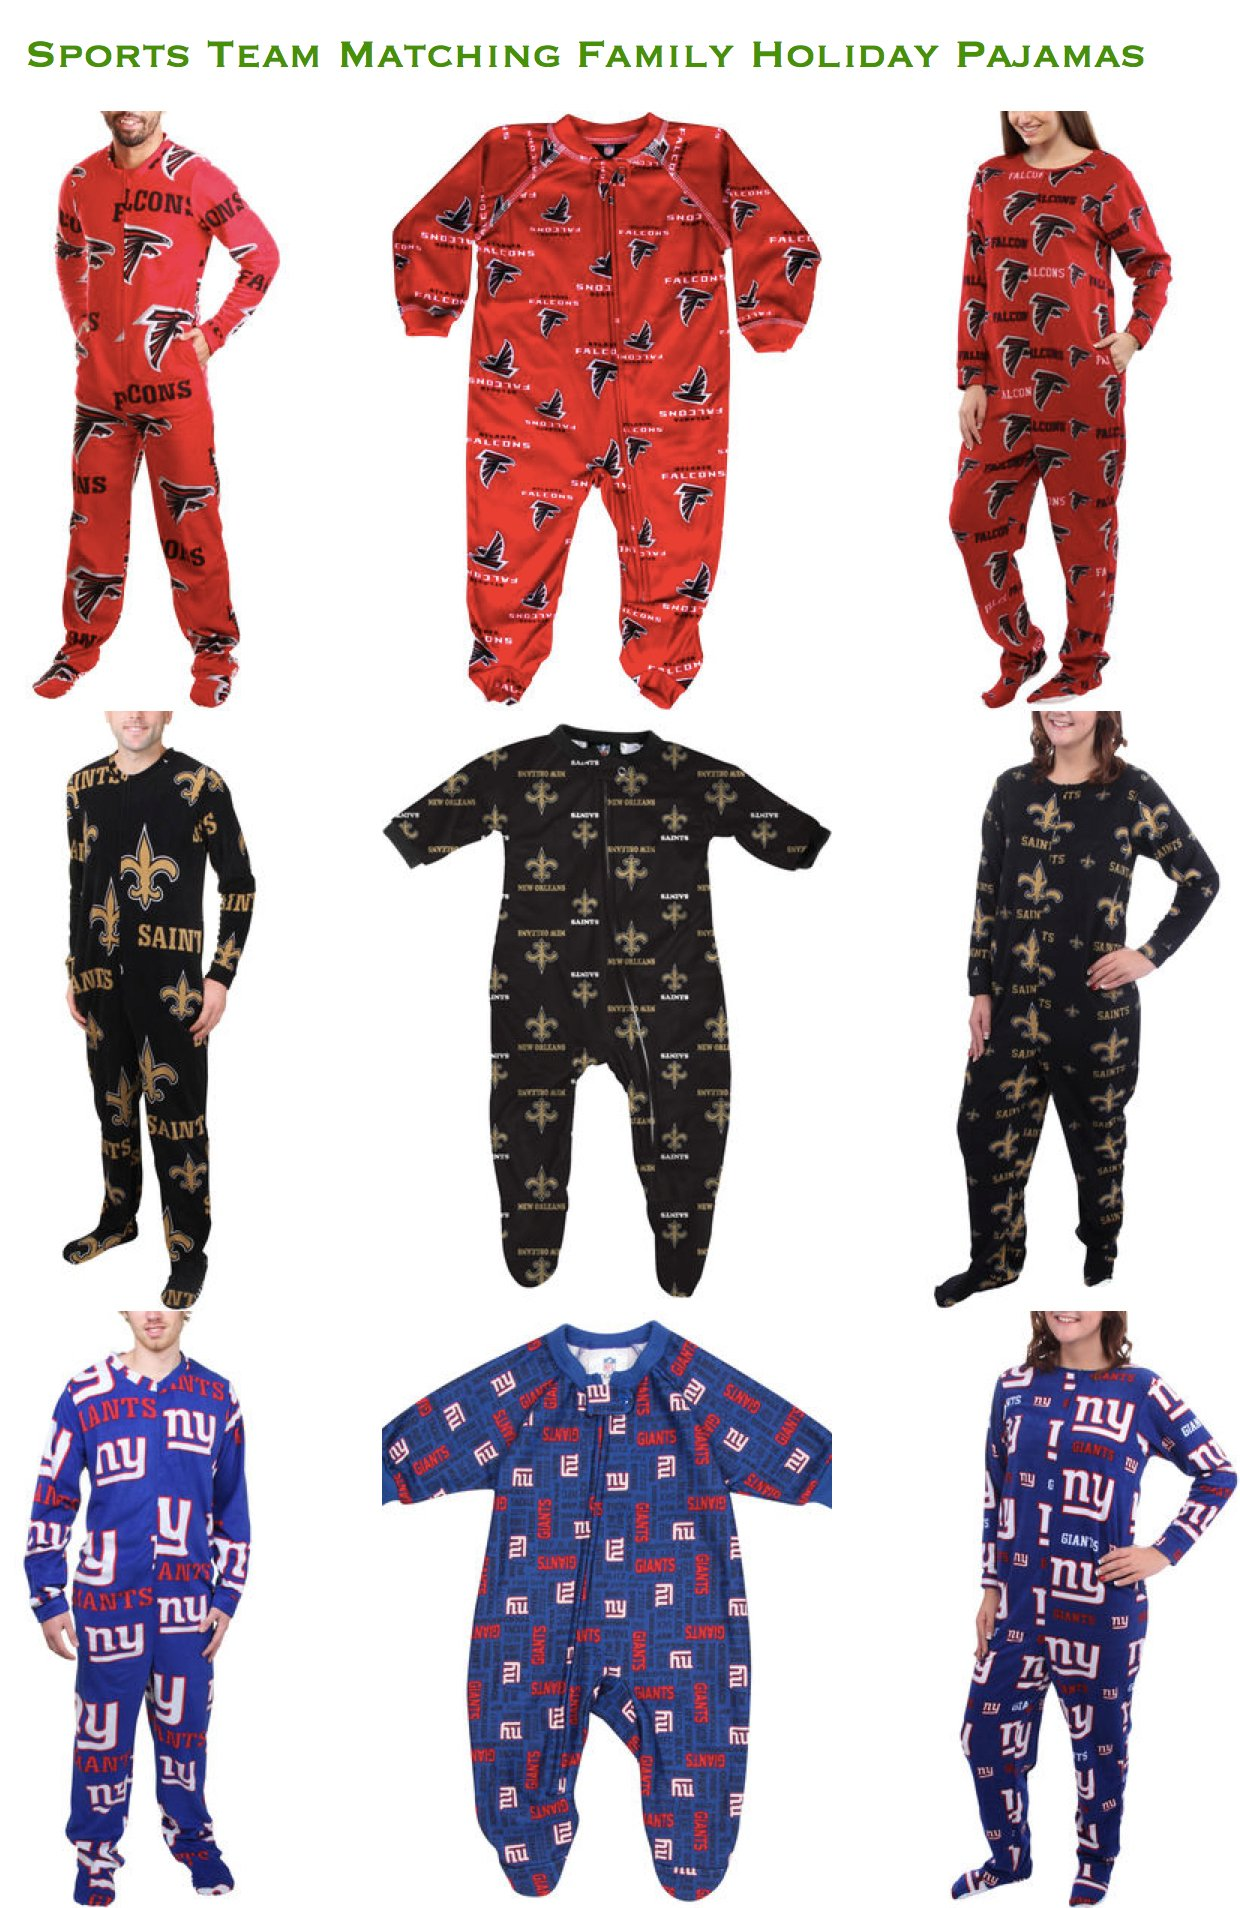 Sports Team Family Matching Holiday Pajamas